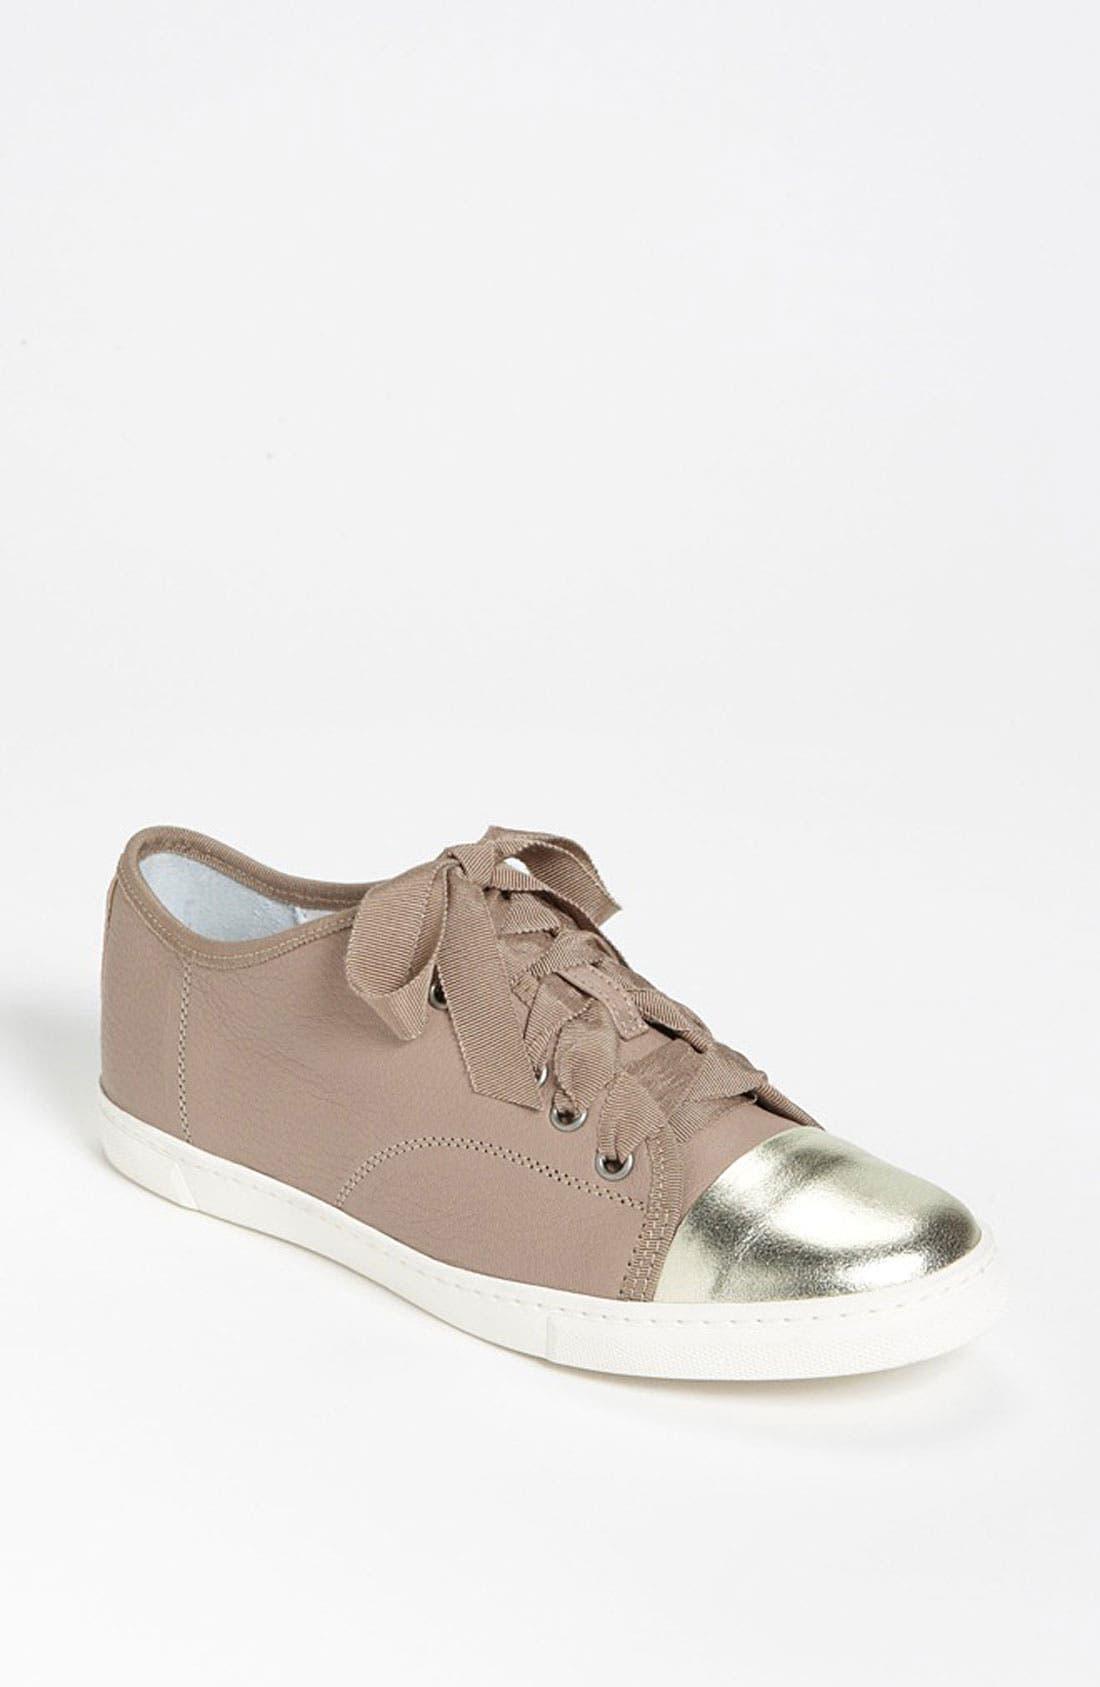 Main Image - Lanvin Cap Toe Sneaker